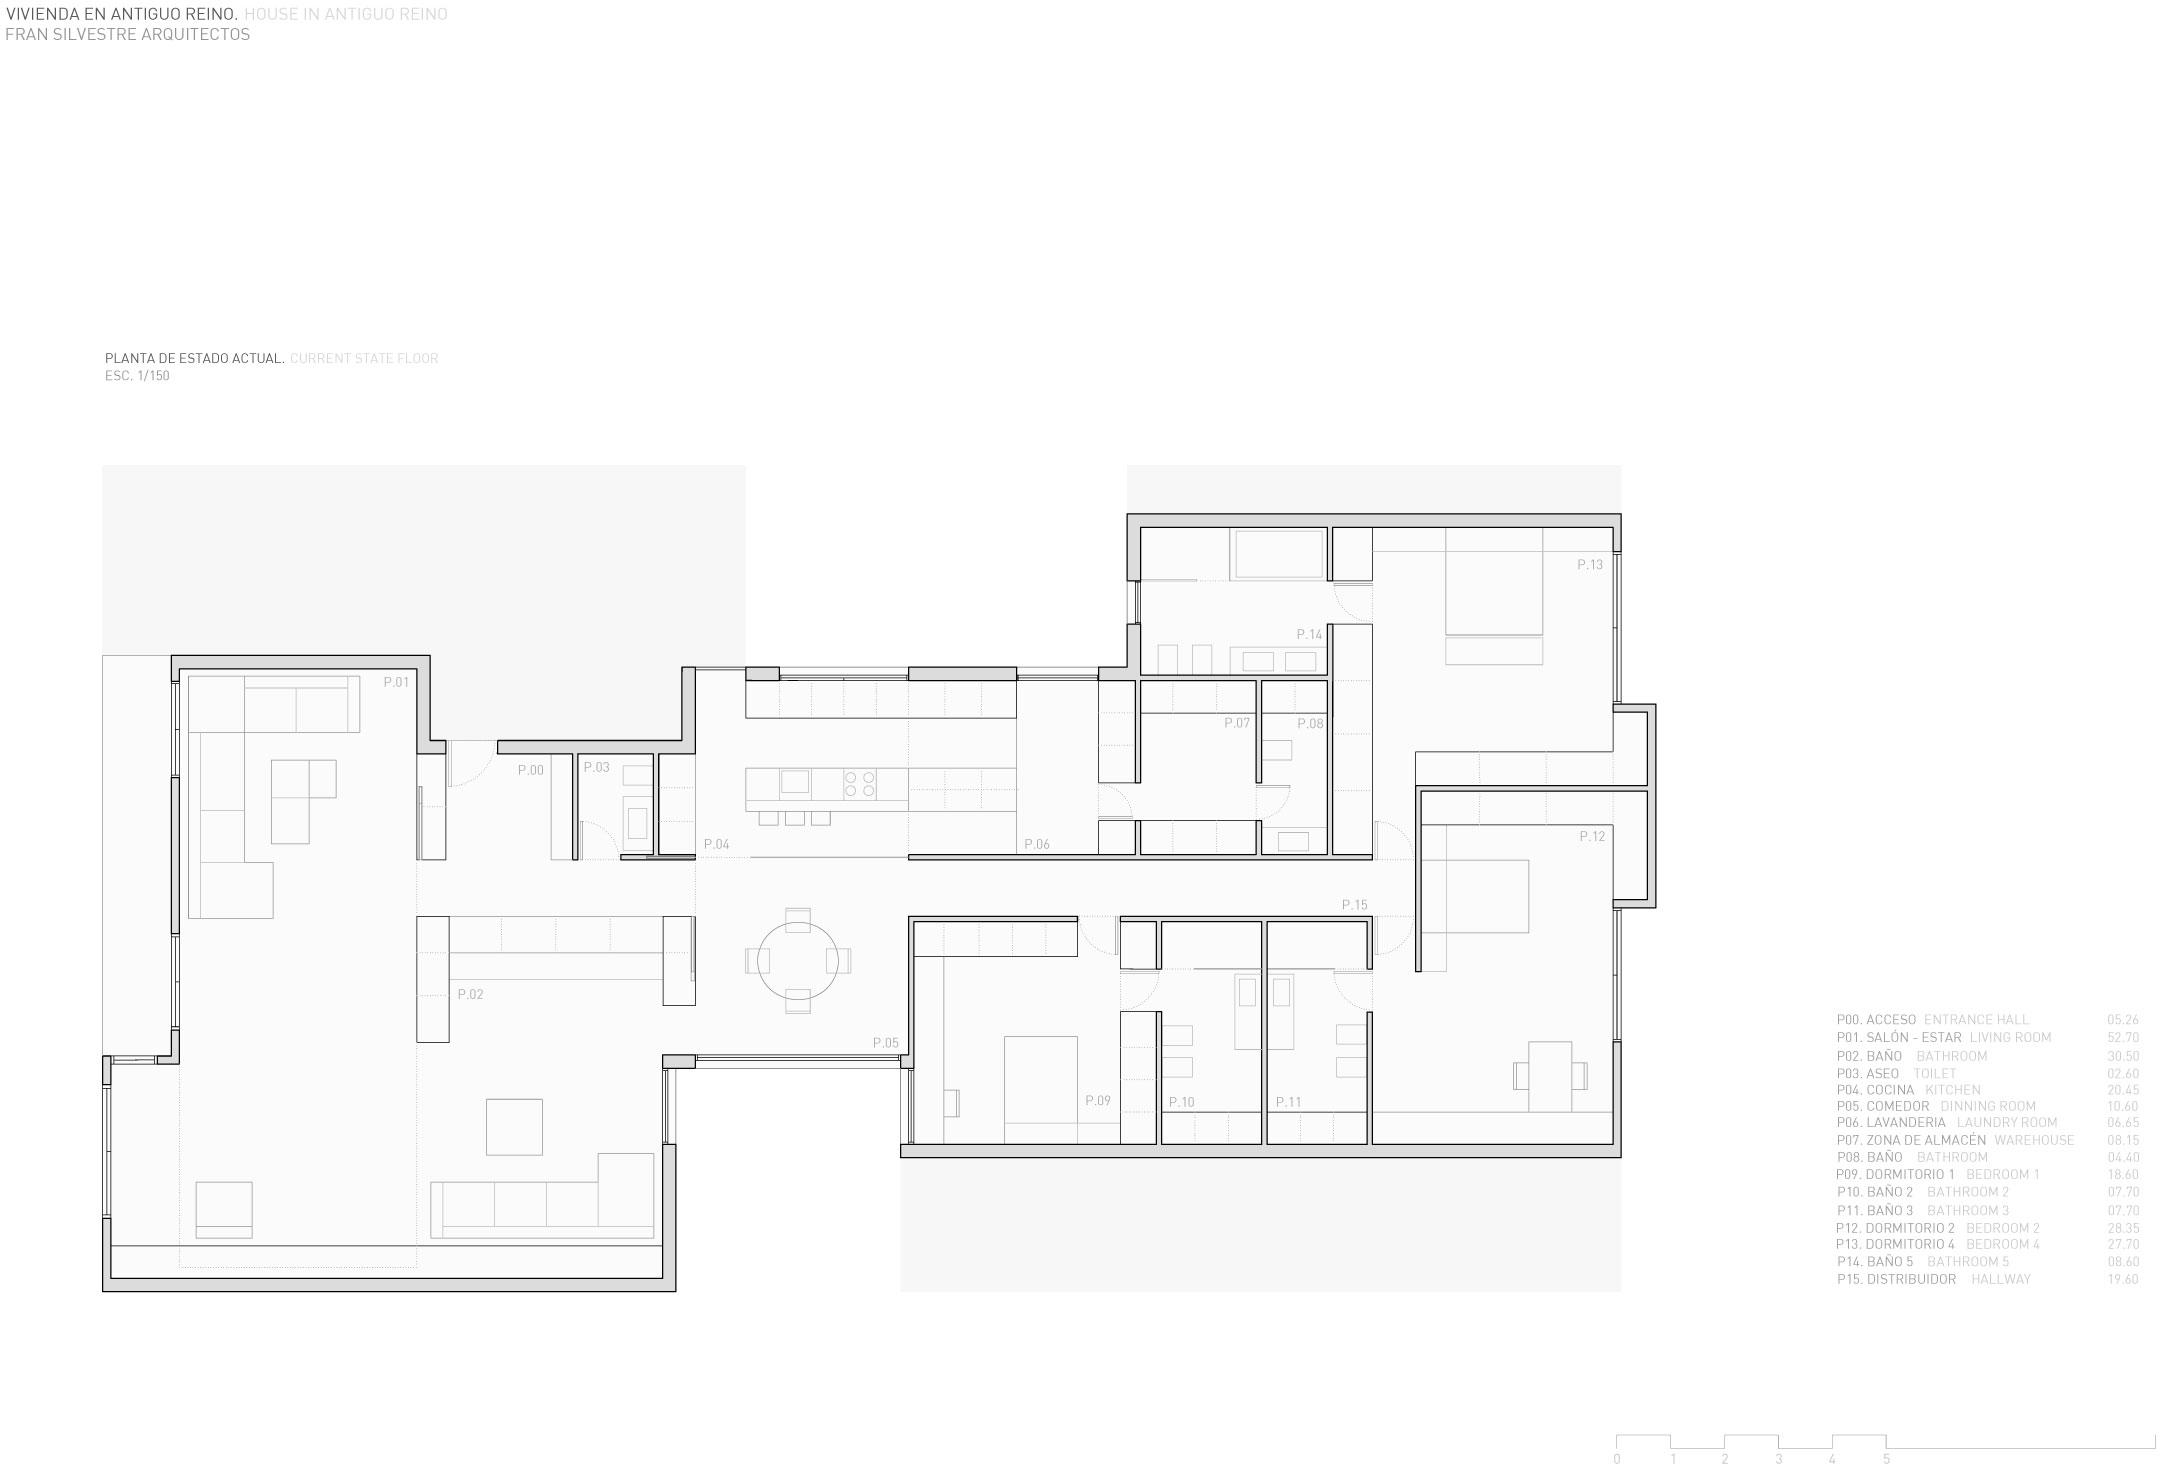 Antiguo-Reino-House-22